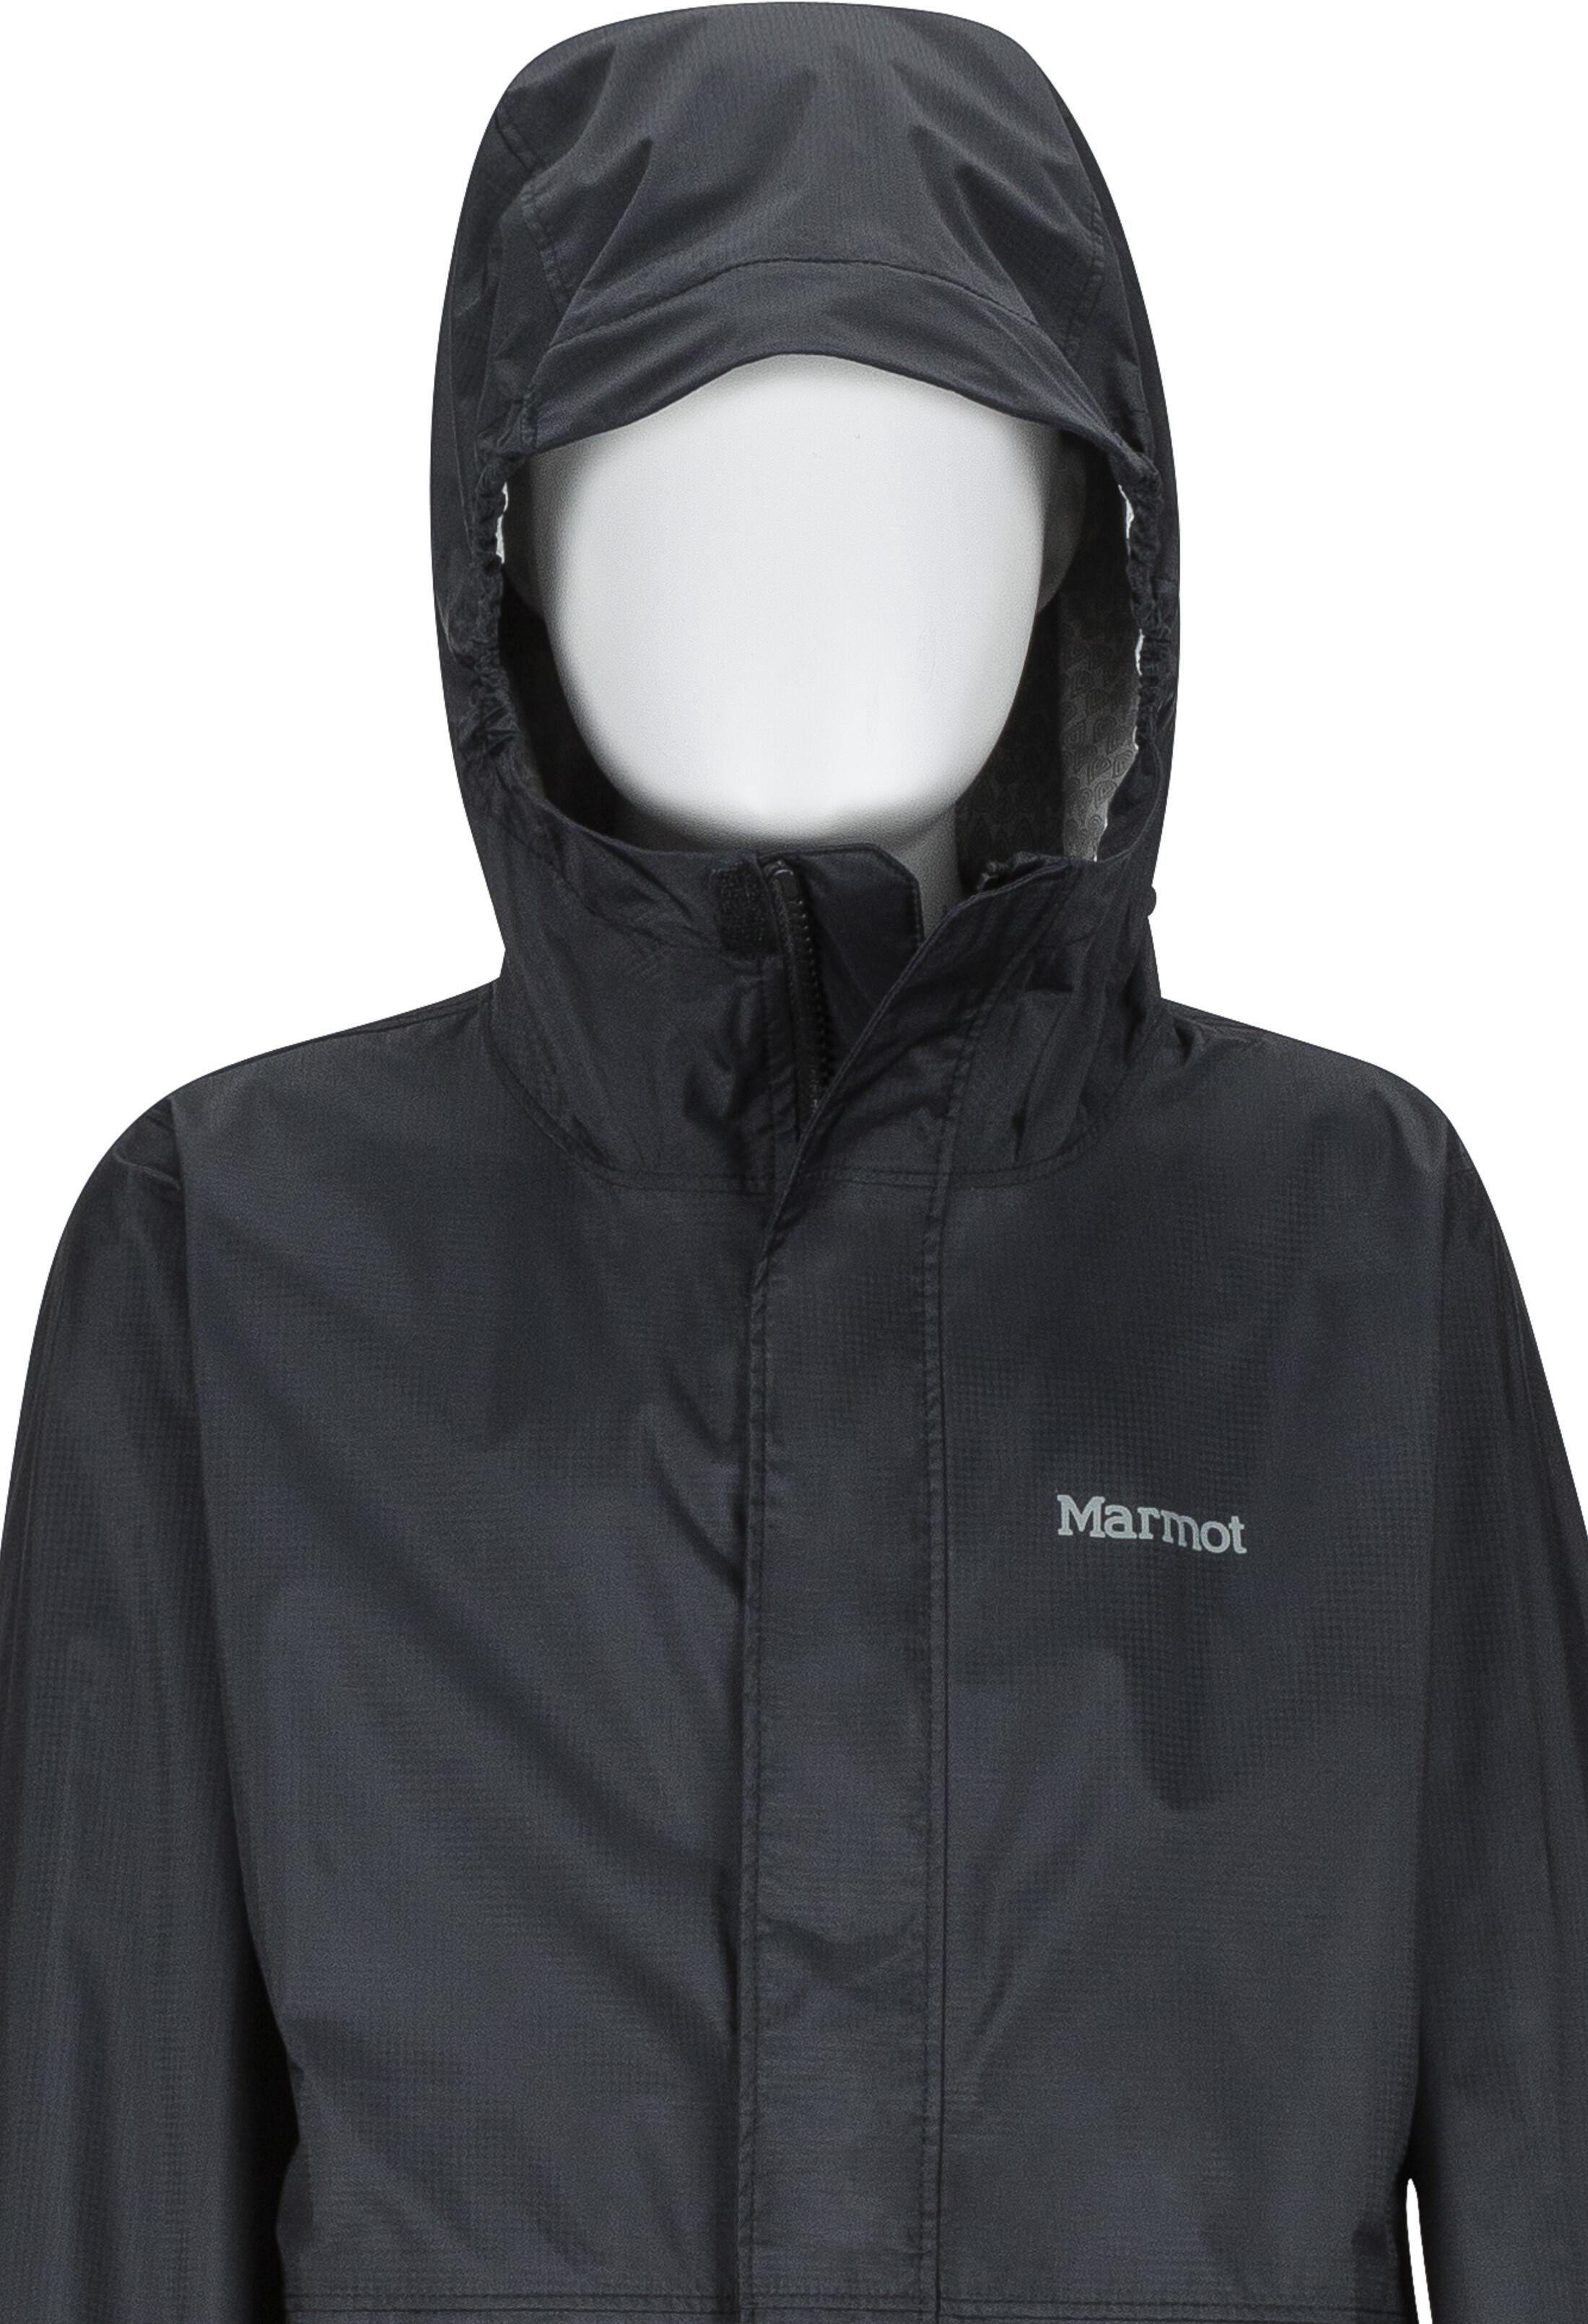 9ad63ddd6 Marmot PreCip Eco Jacket Children black at Addnature.co.uk